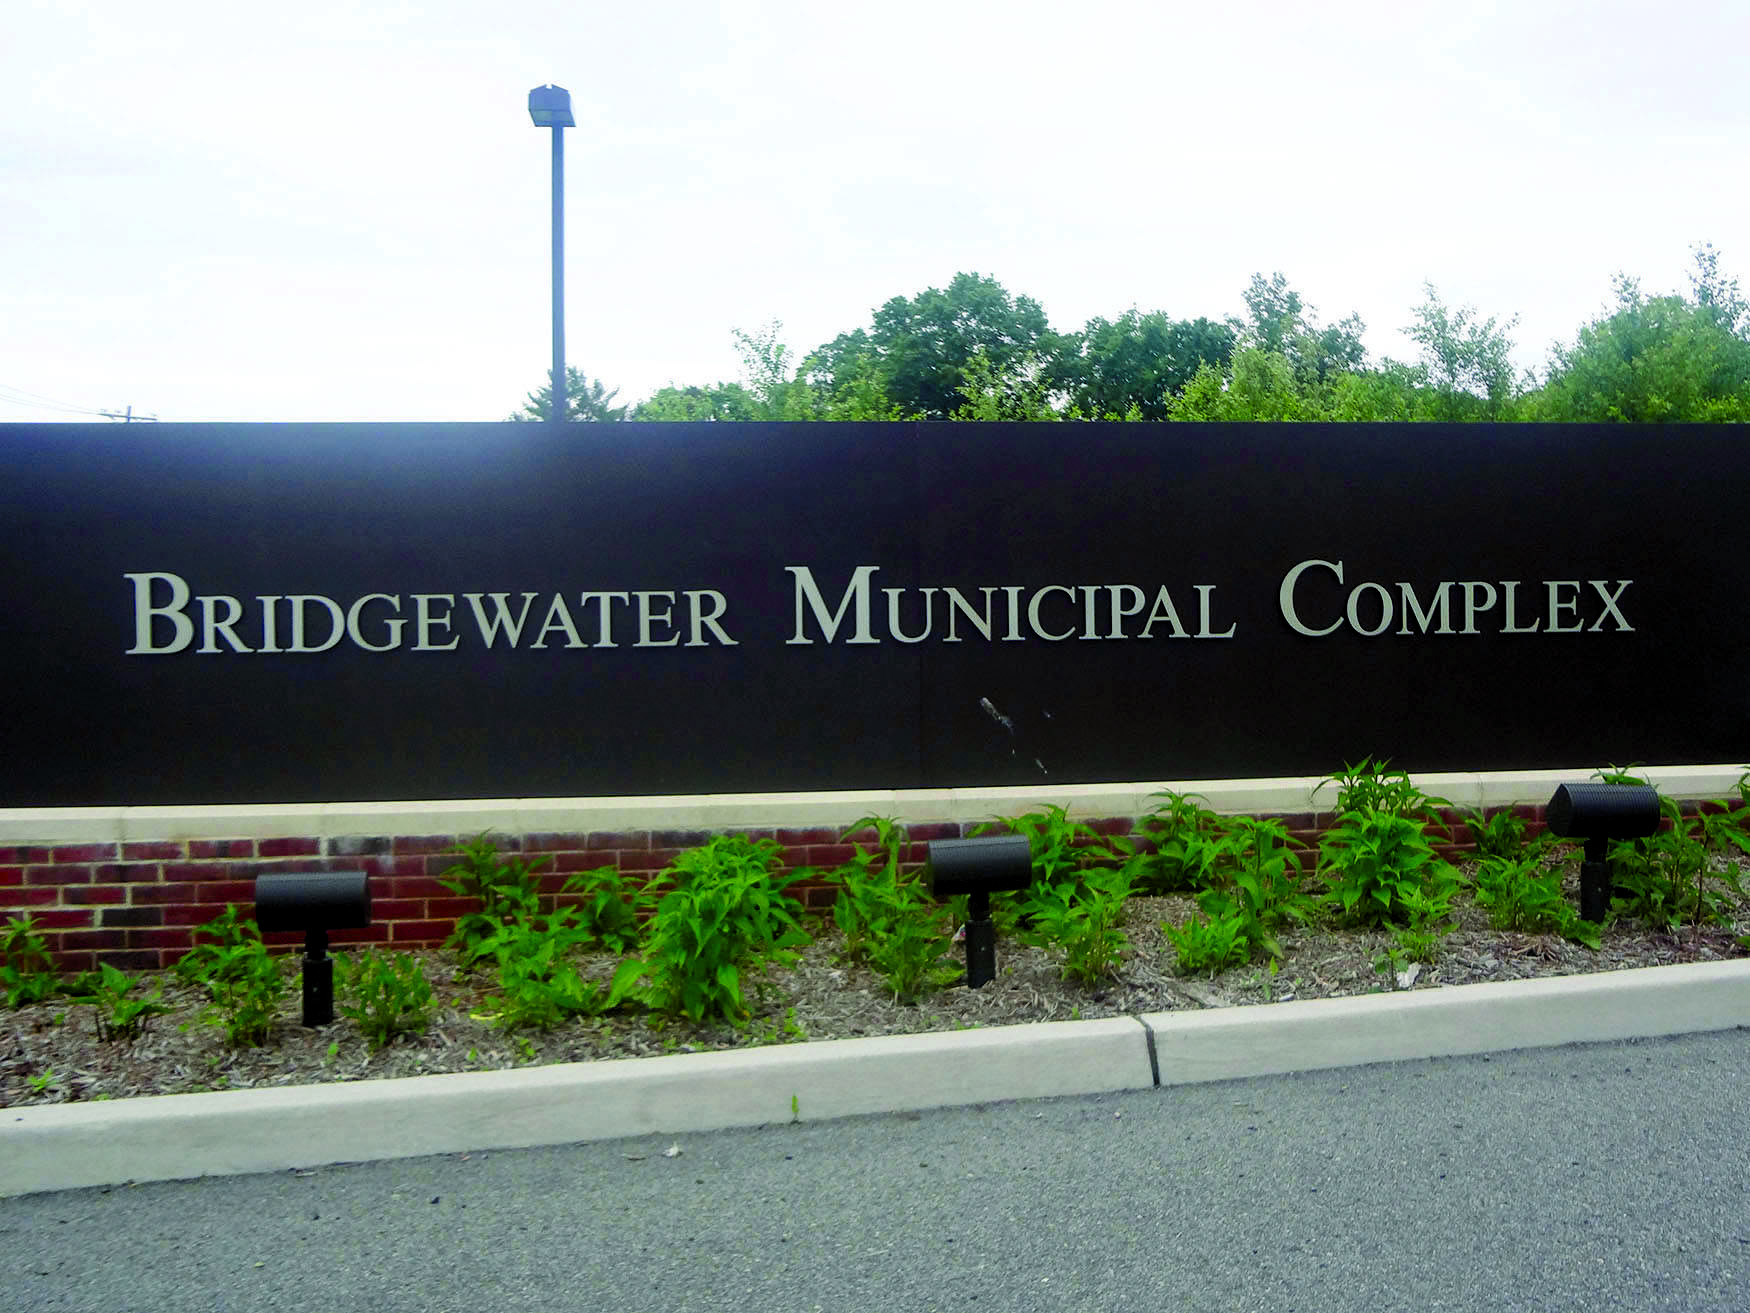 495d068870fd166c2b16_Bridgewater_municipal.jpg